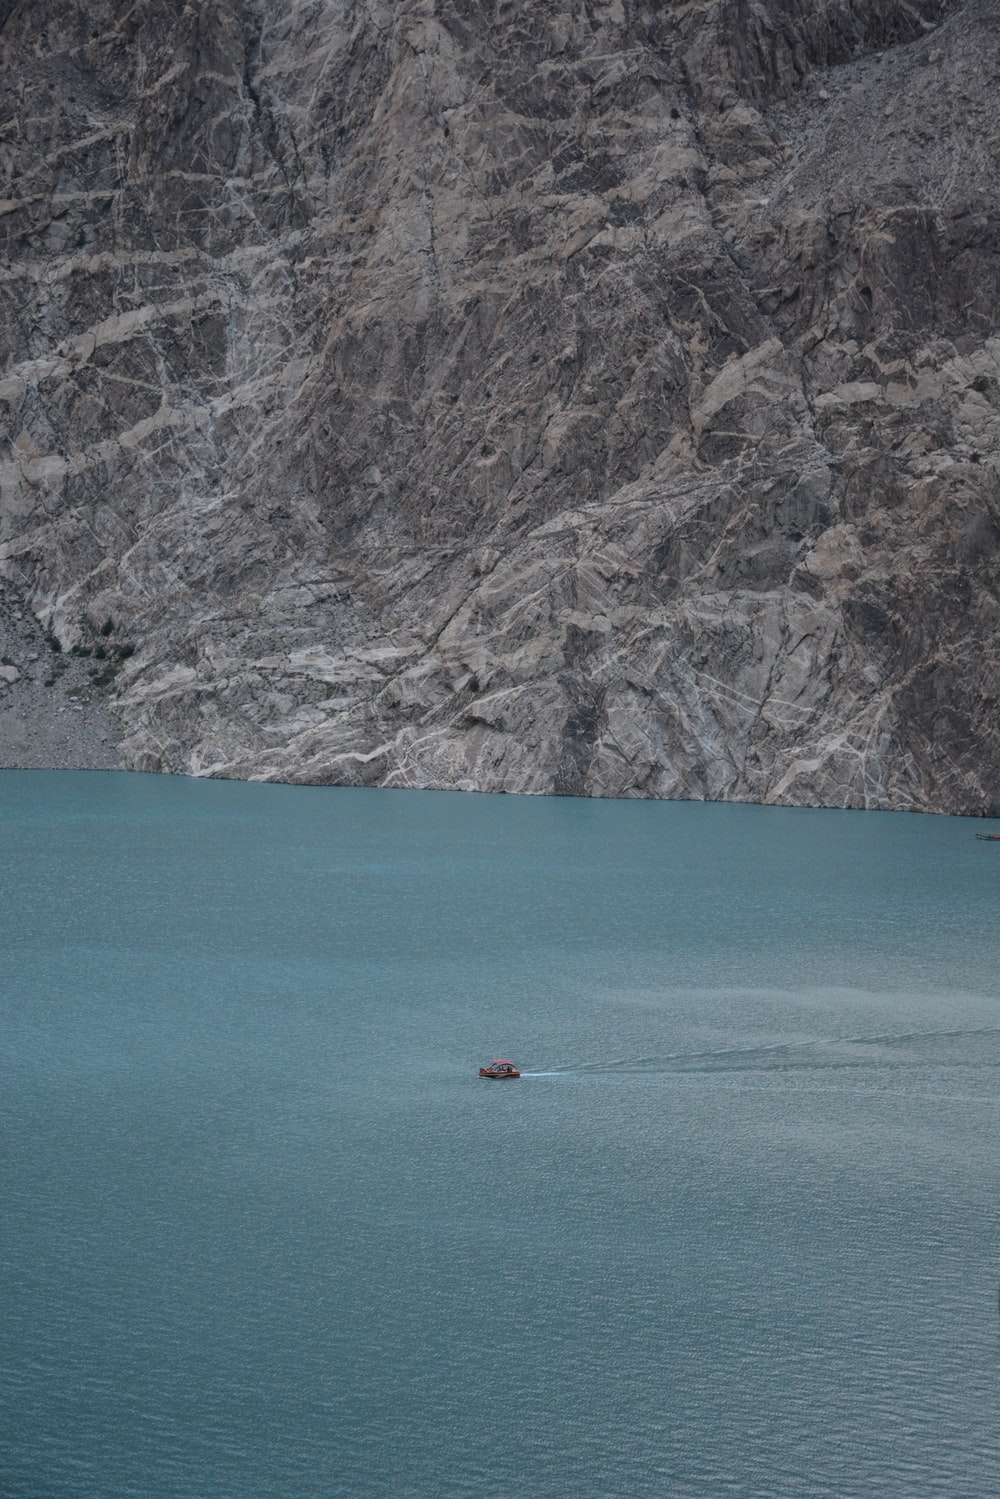 boat on lake near cliff